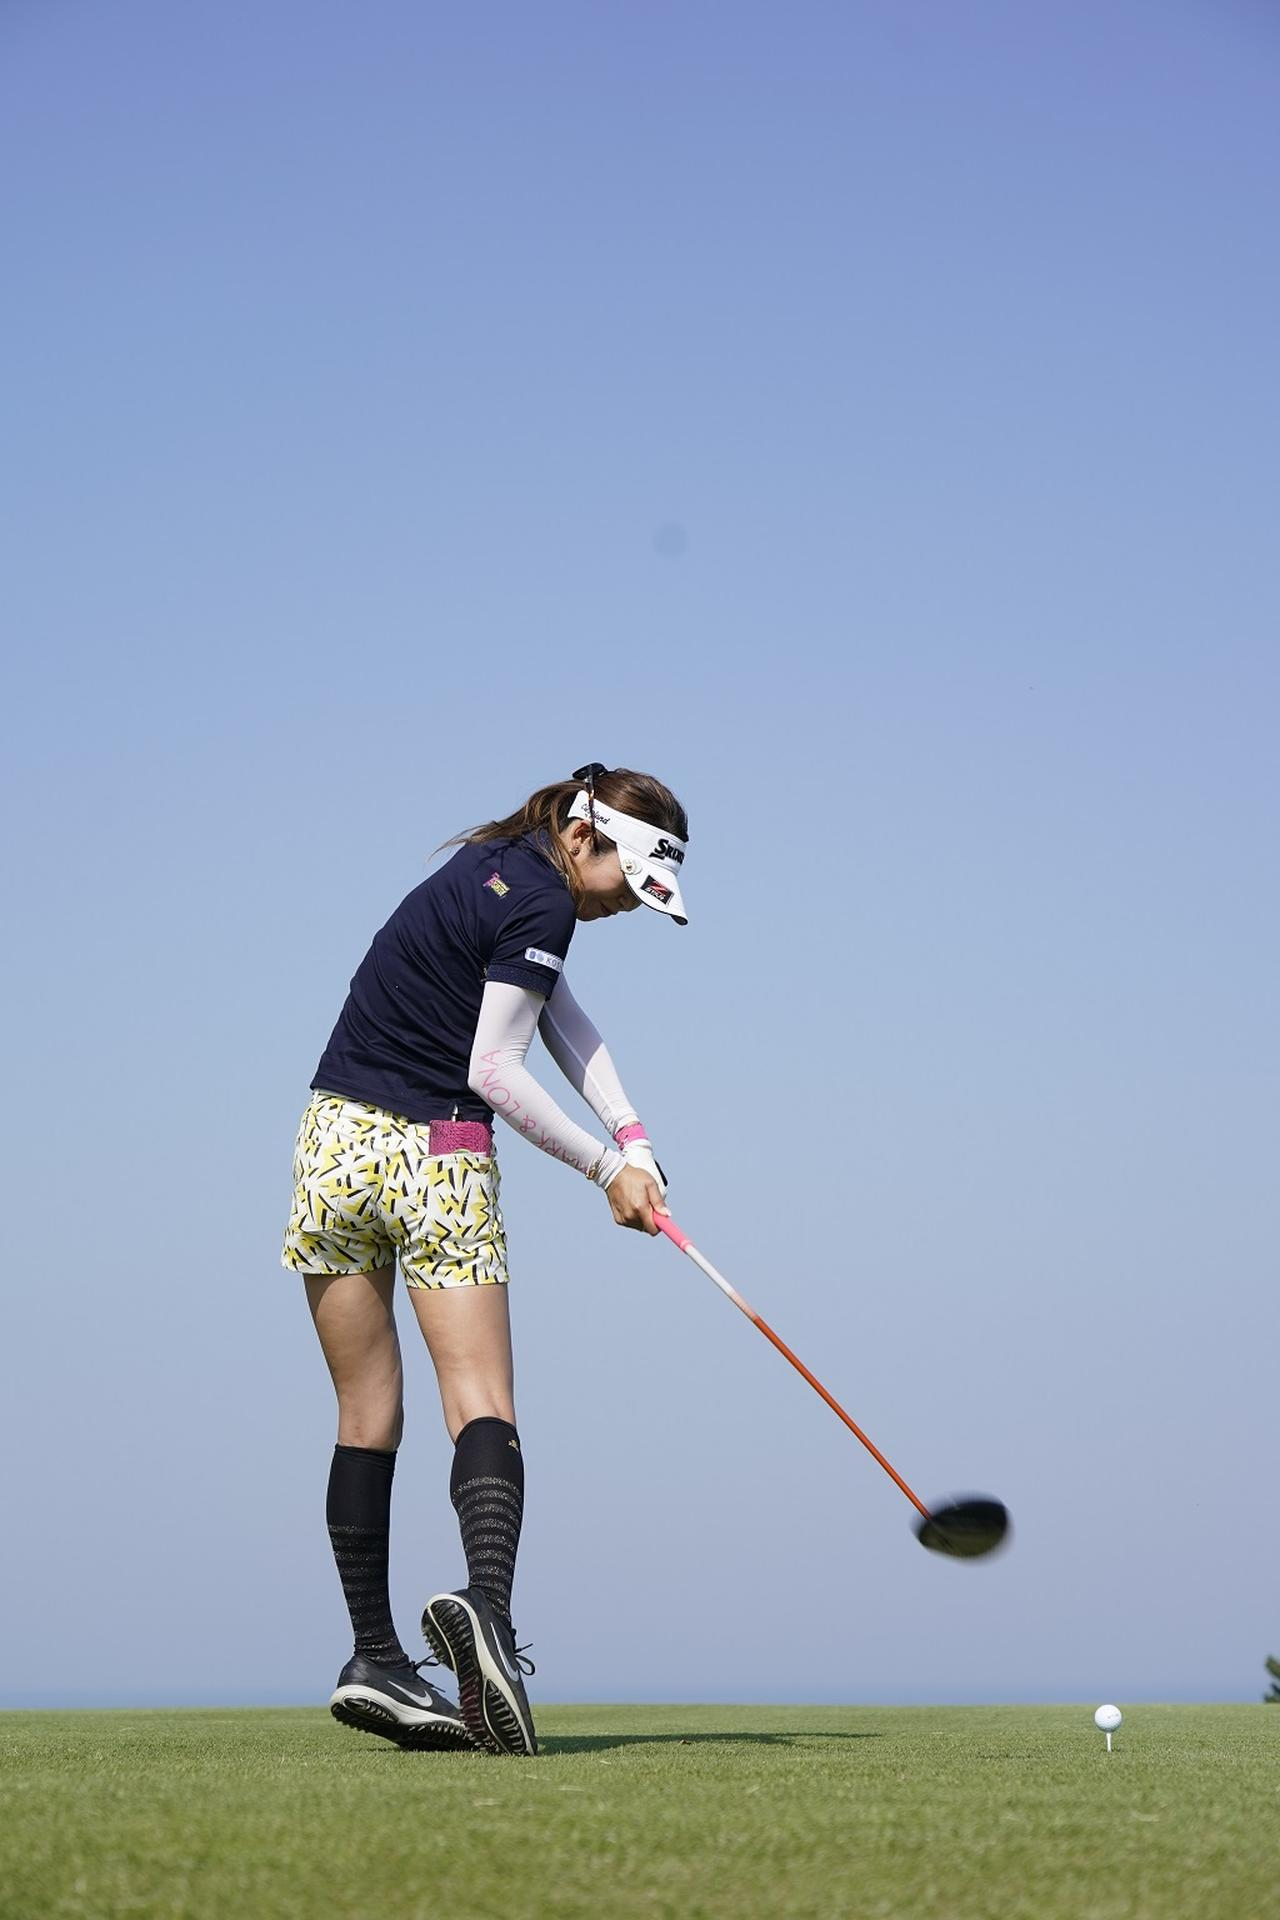 Images : 8番目の画像 - 金田久美子ドライバー後方連続写真 - みんなのゴルフダイジェスト